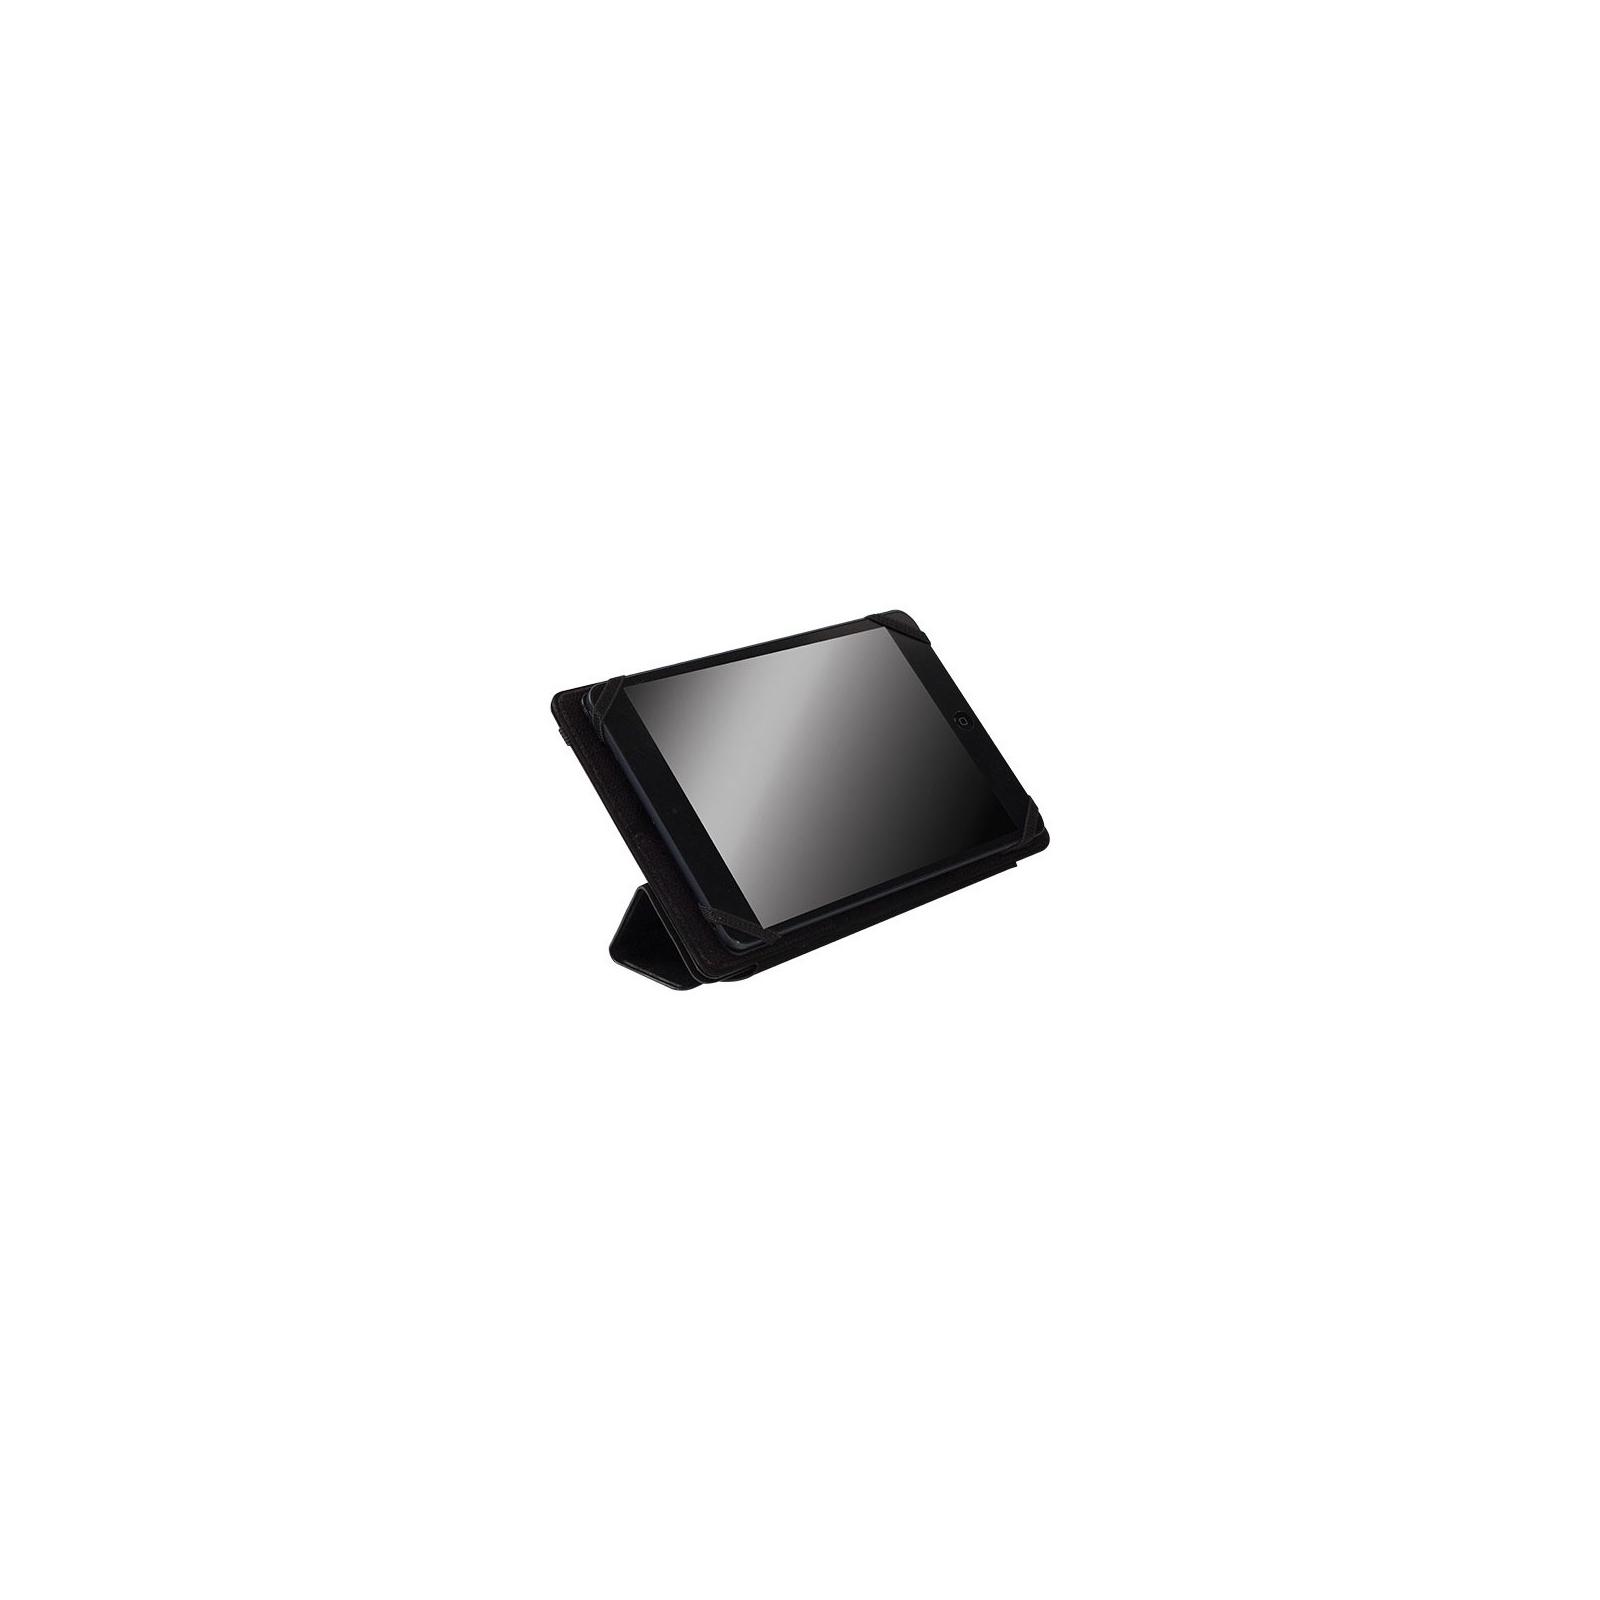 Чехол для планшета Krusell 6-7.9'' Dons Universal Black (71330) изображение 6